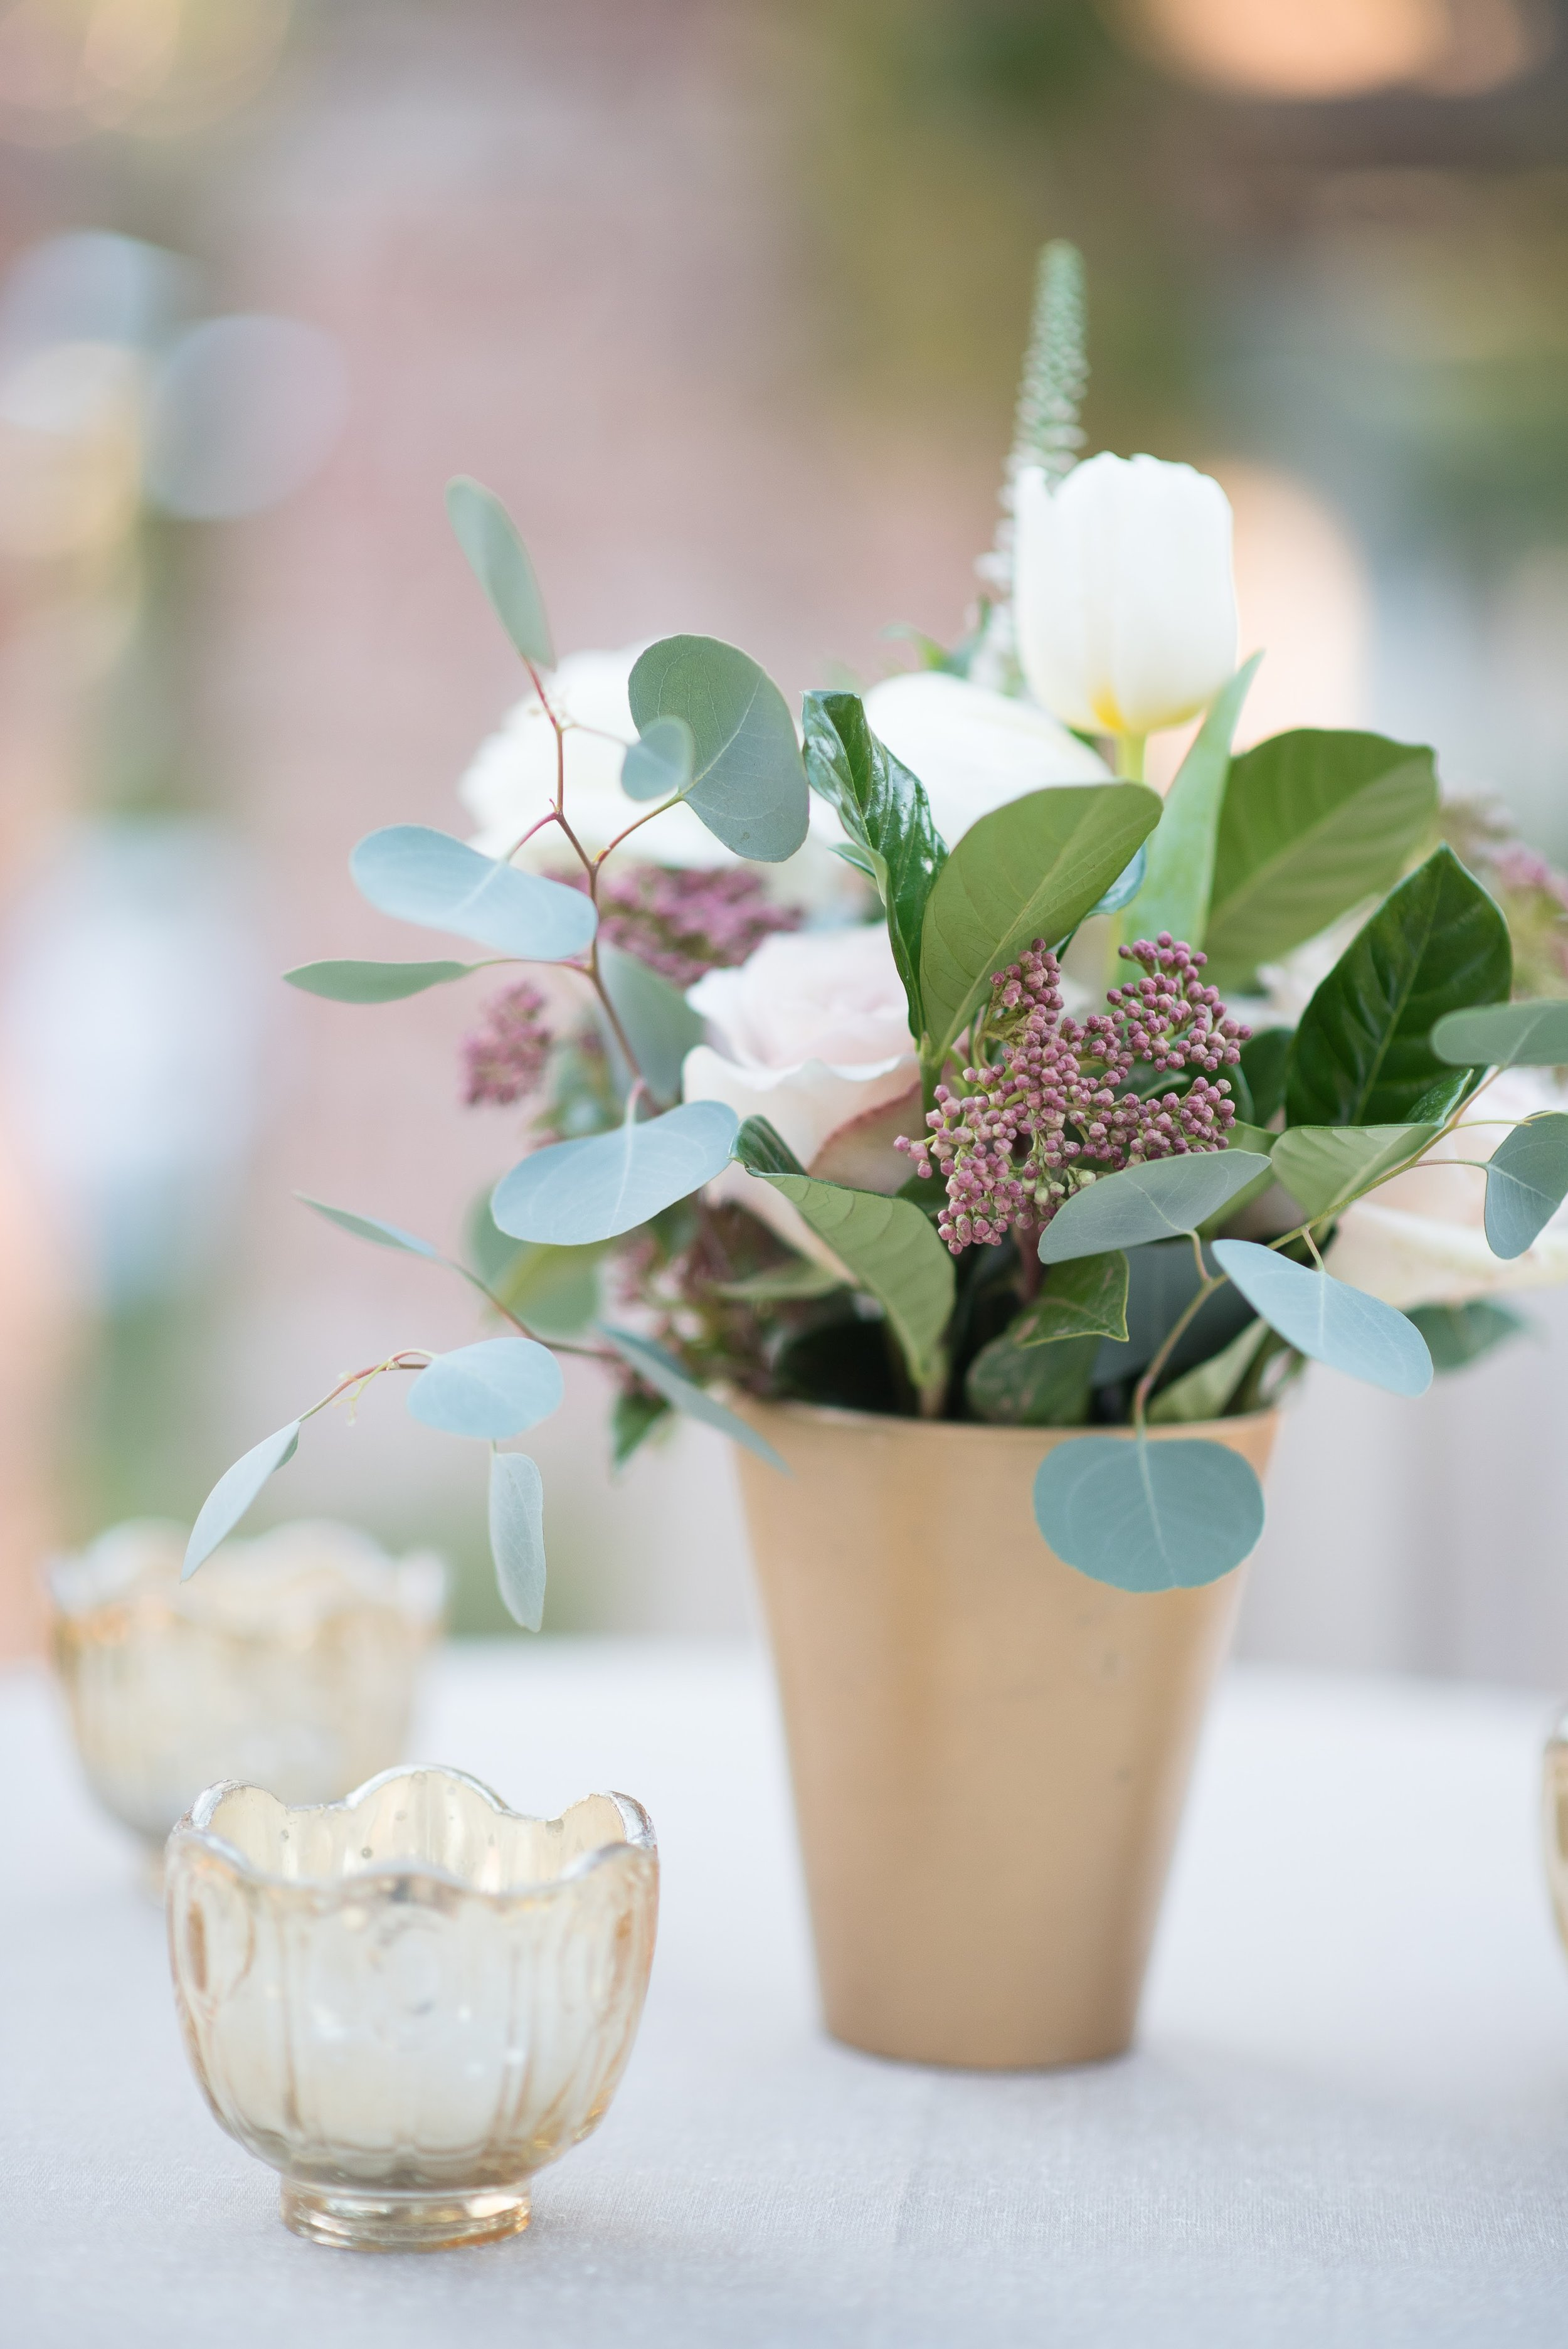 www.santabarbaraweddingstyle.com | San | Felici Events | El Encanto | Nate & Jenny Weddings | Bellavista Designs Lighting | Precious and Blooming | Wedding Ceremony | Cocktail Floral Gold